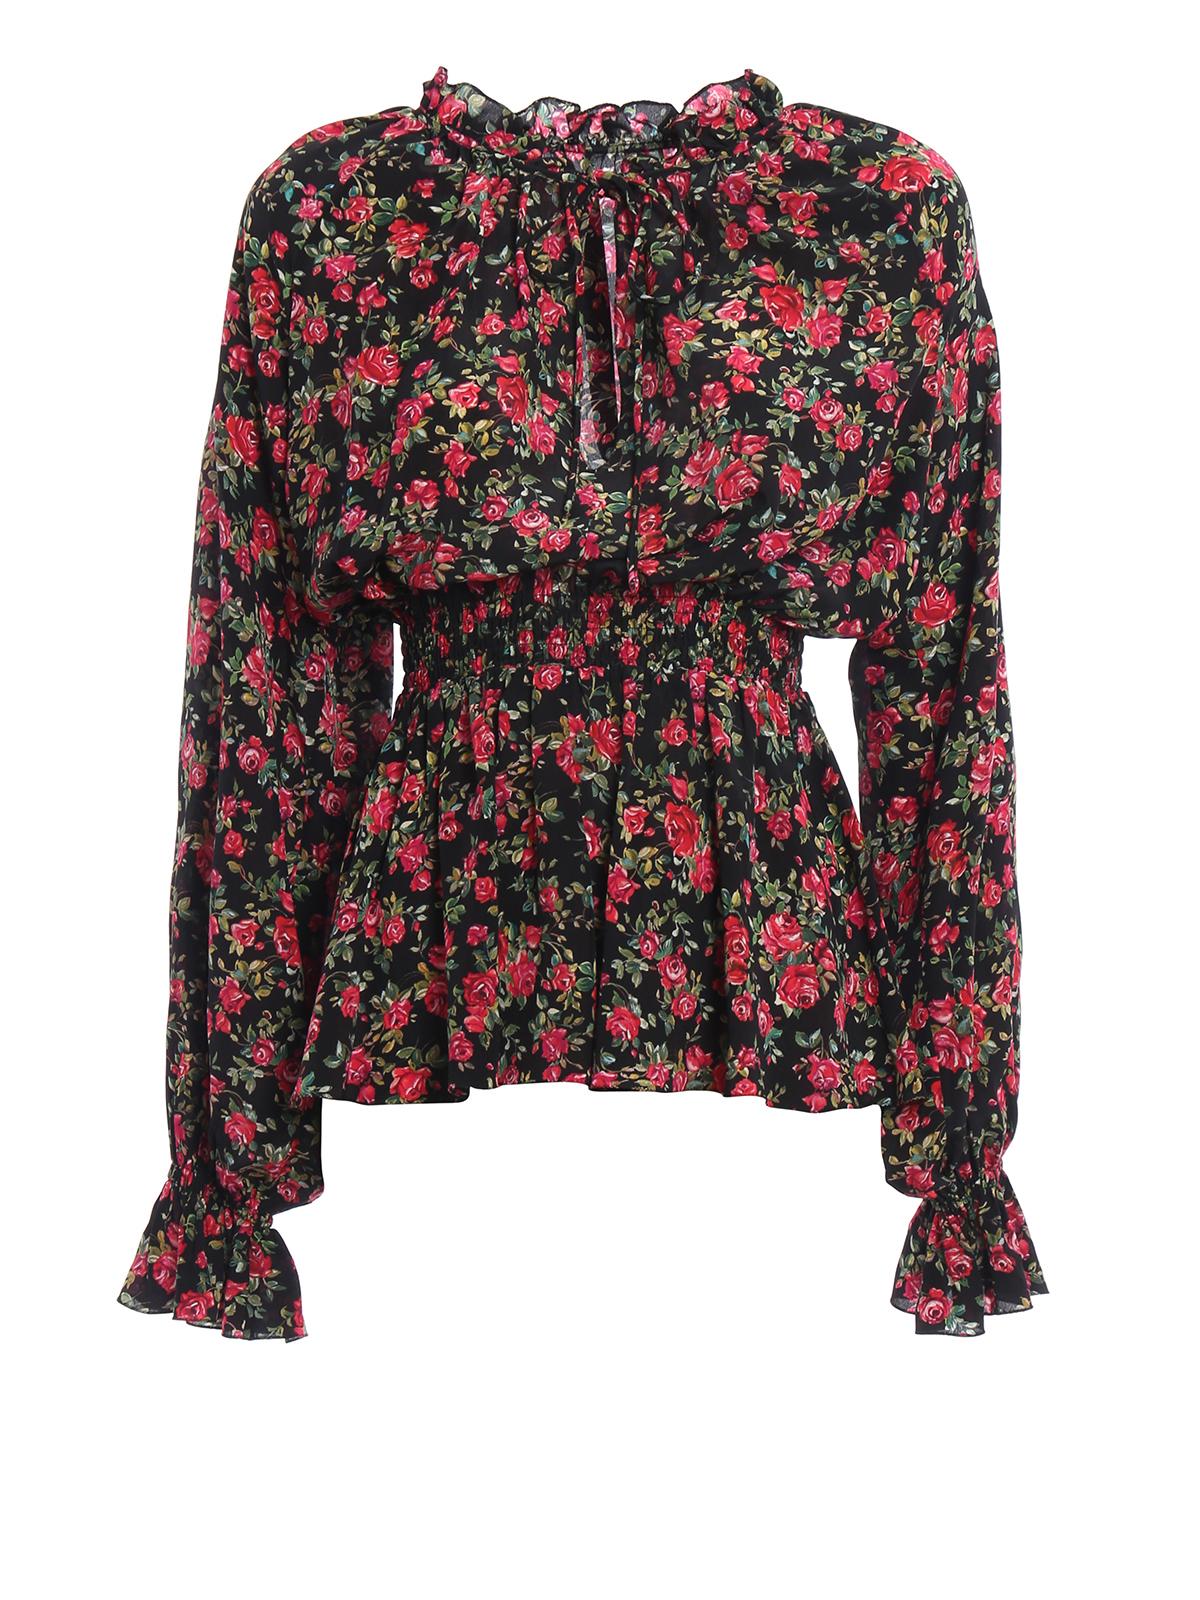 847d4c564370b8 Dolce   Gabbana - Small rose print silk blouse - blouses ...